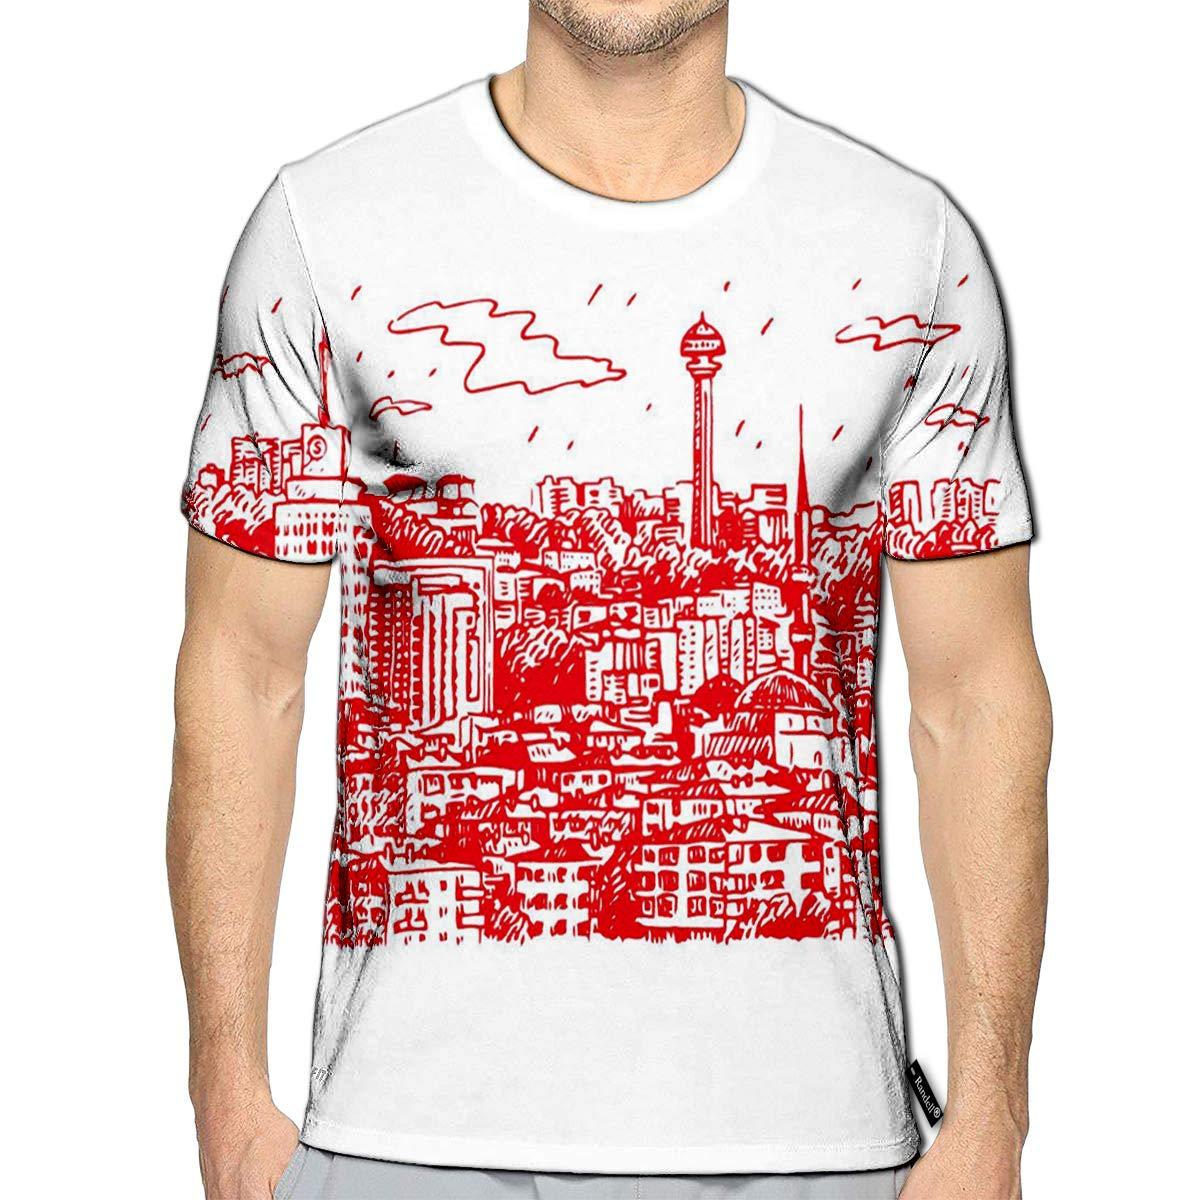 Randell 3D Printed T-Shirts View of Ankara Capital City Turkey Freehand Pencil Sketch Sh